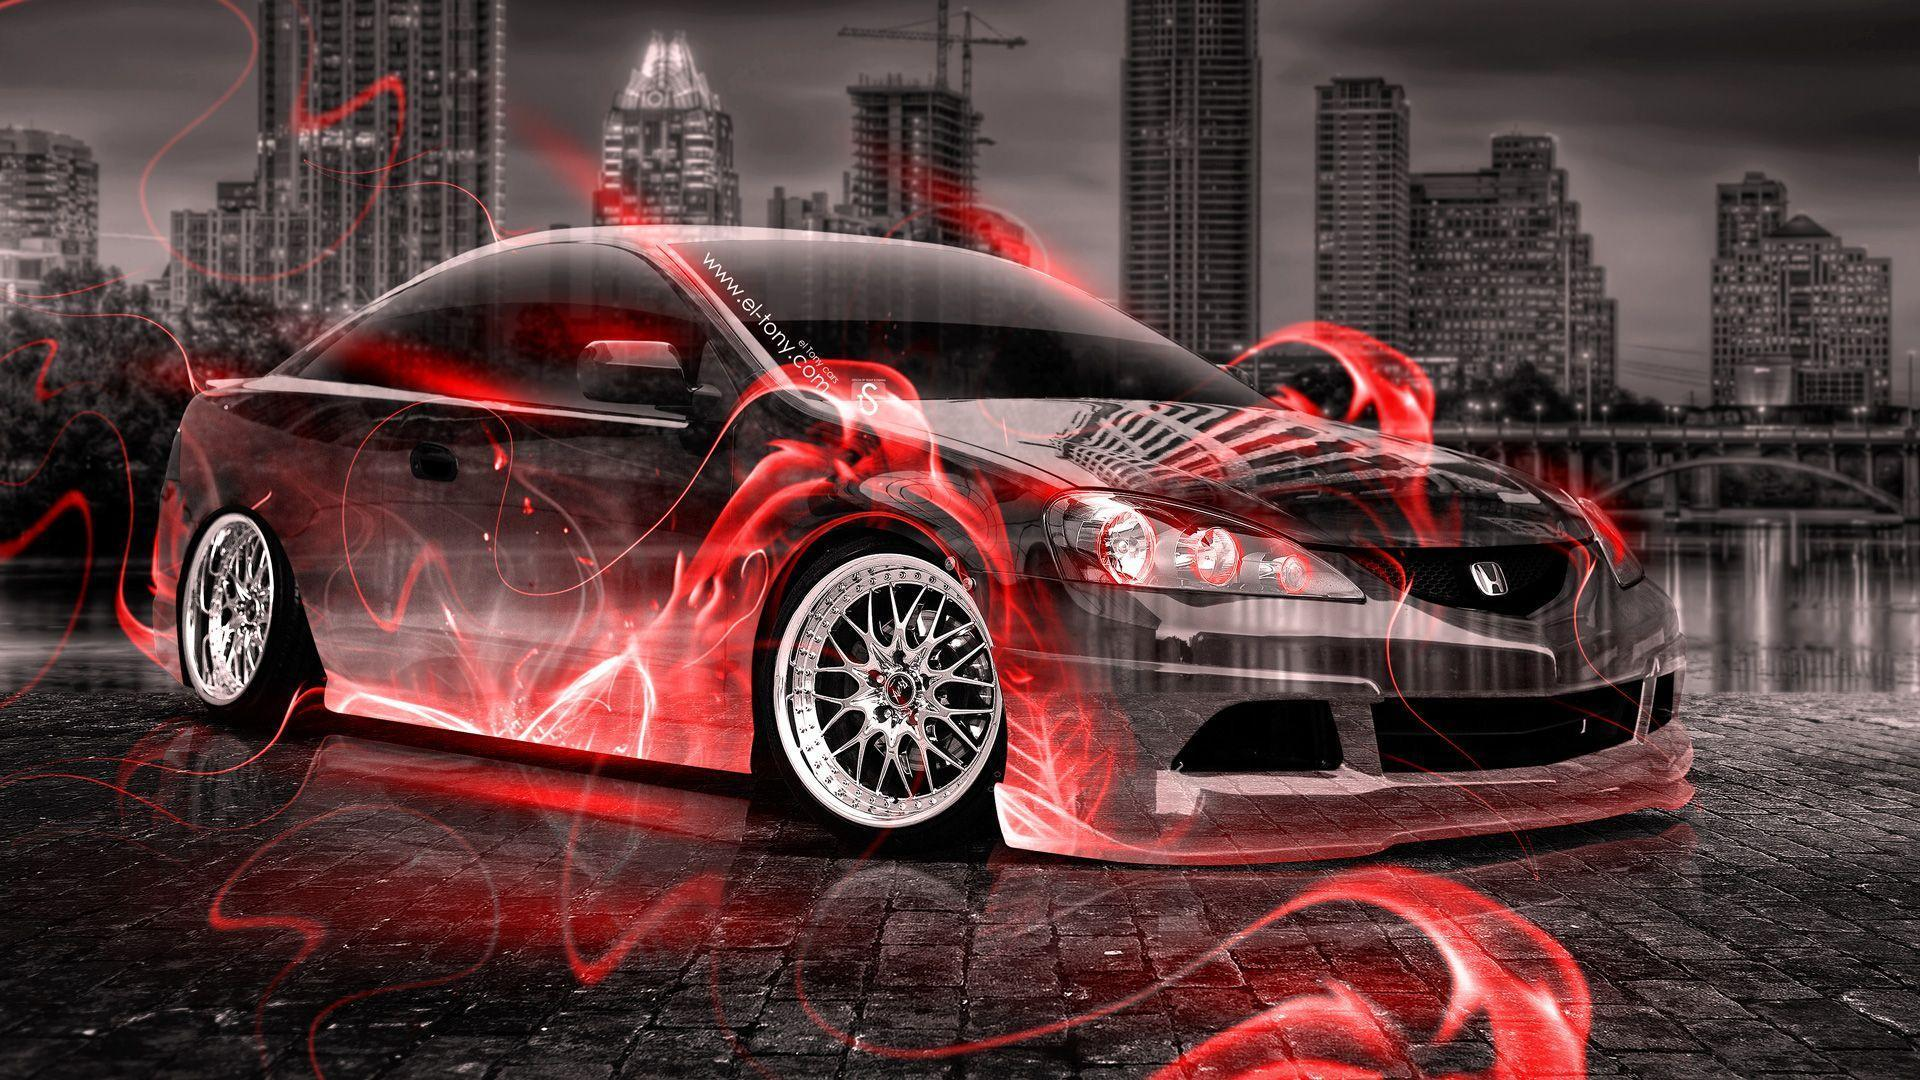 Honda Integra JDM Crystal Fire City Car 2014 | El Tony